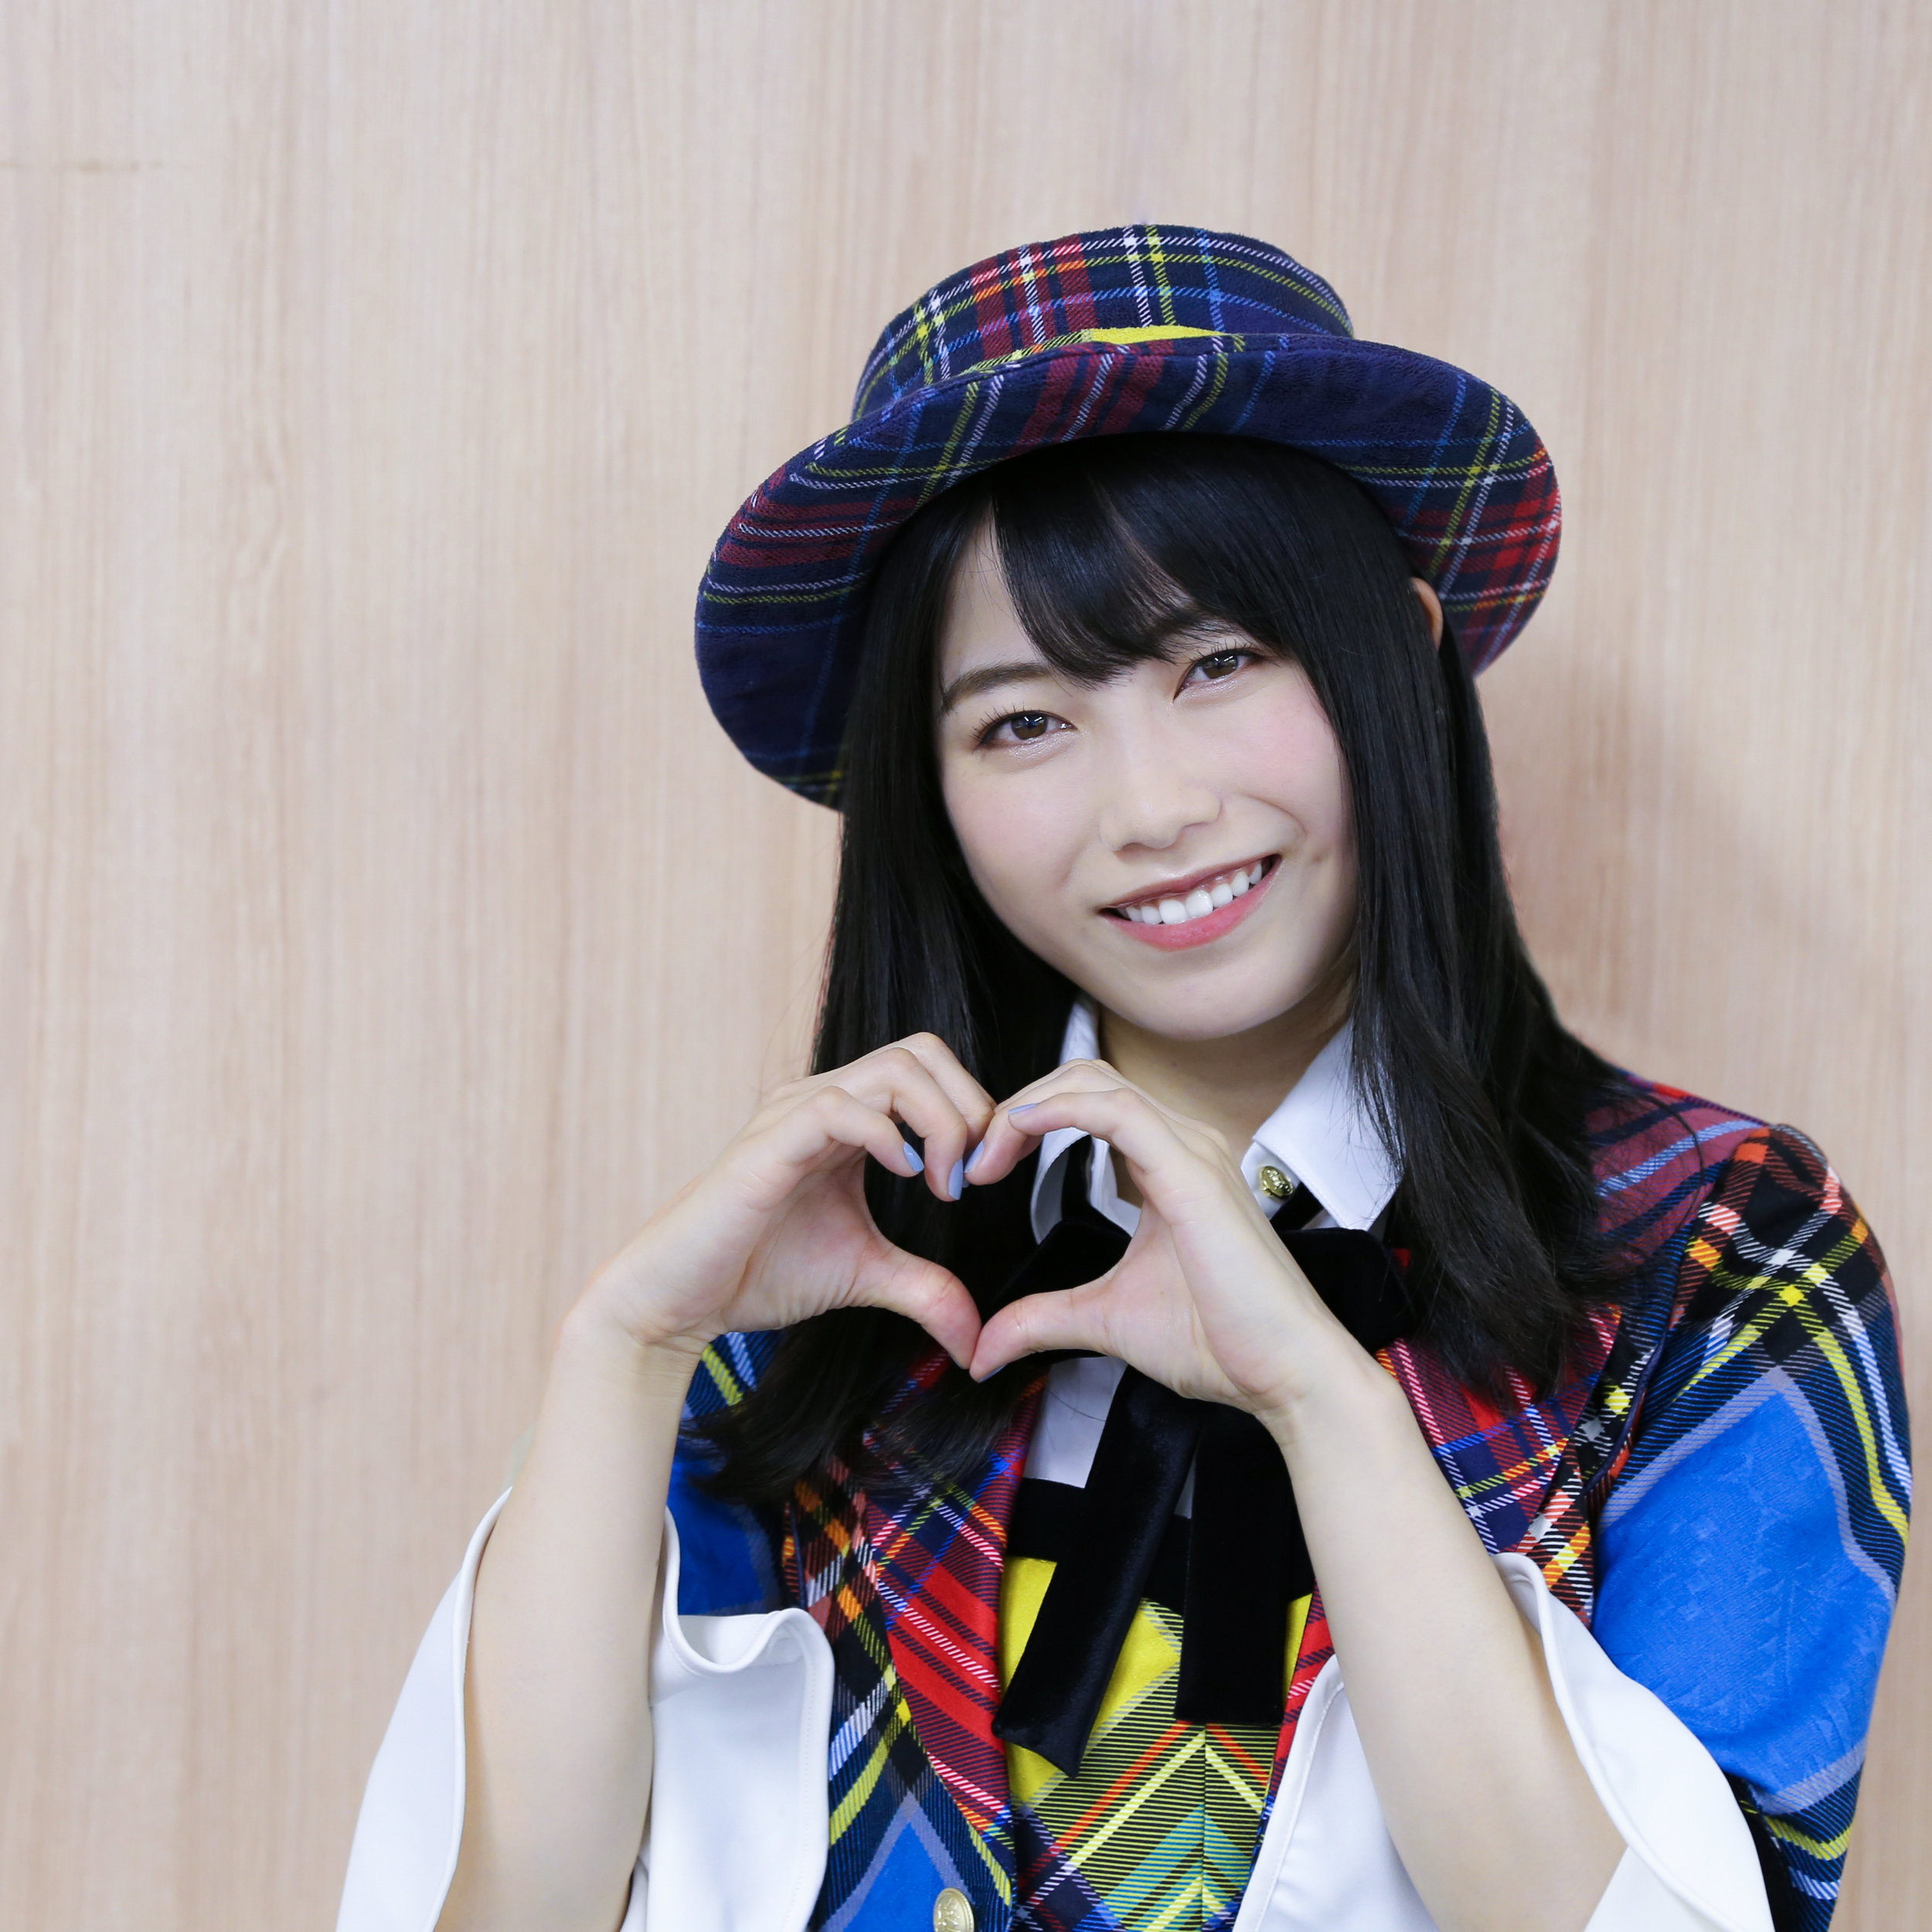 AKB48-0543 Final.JPG